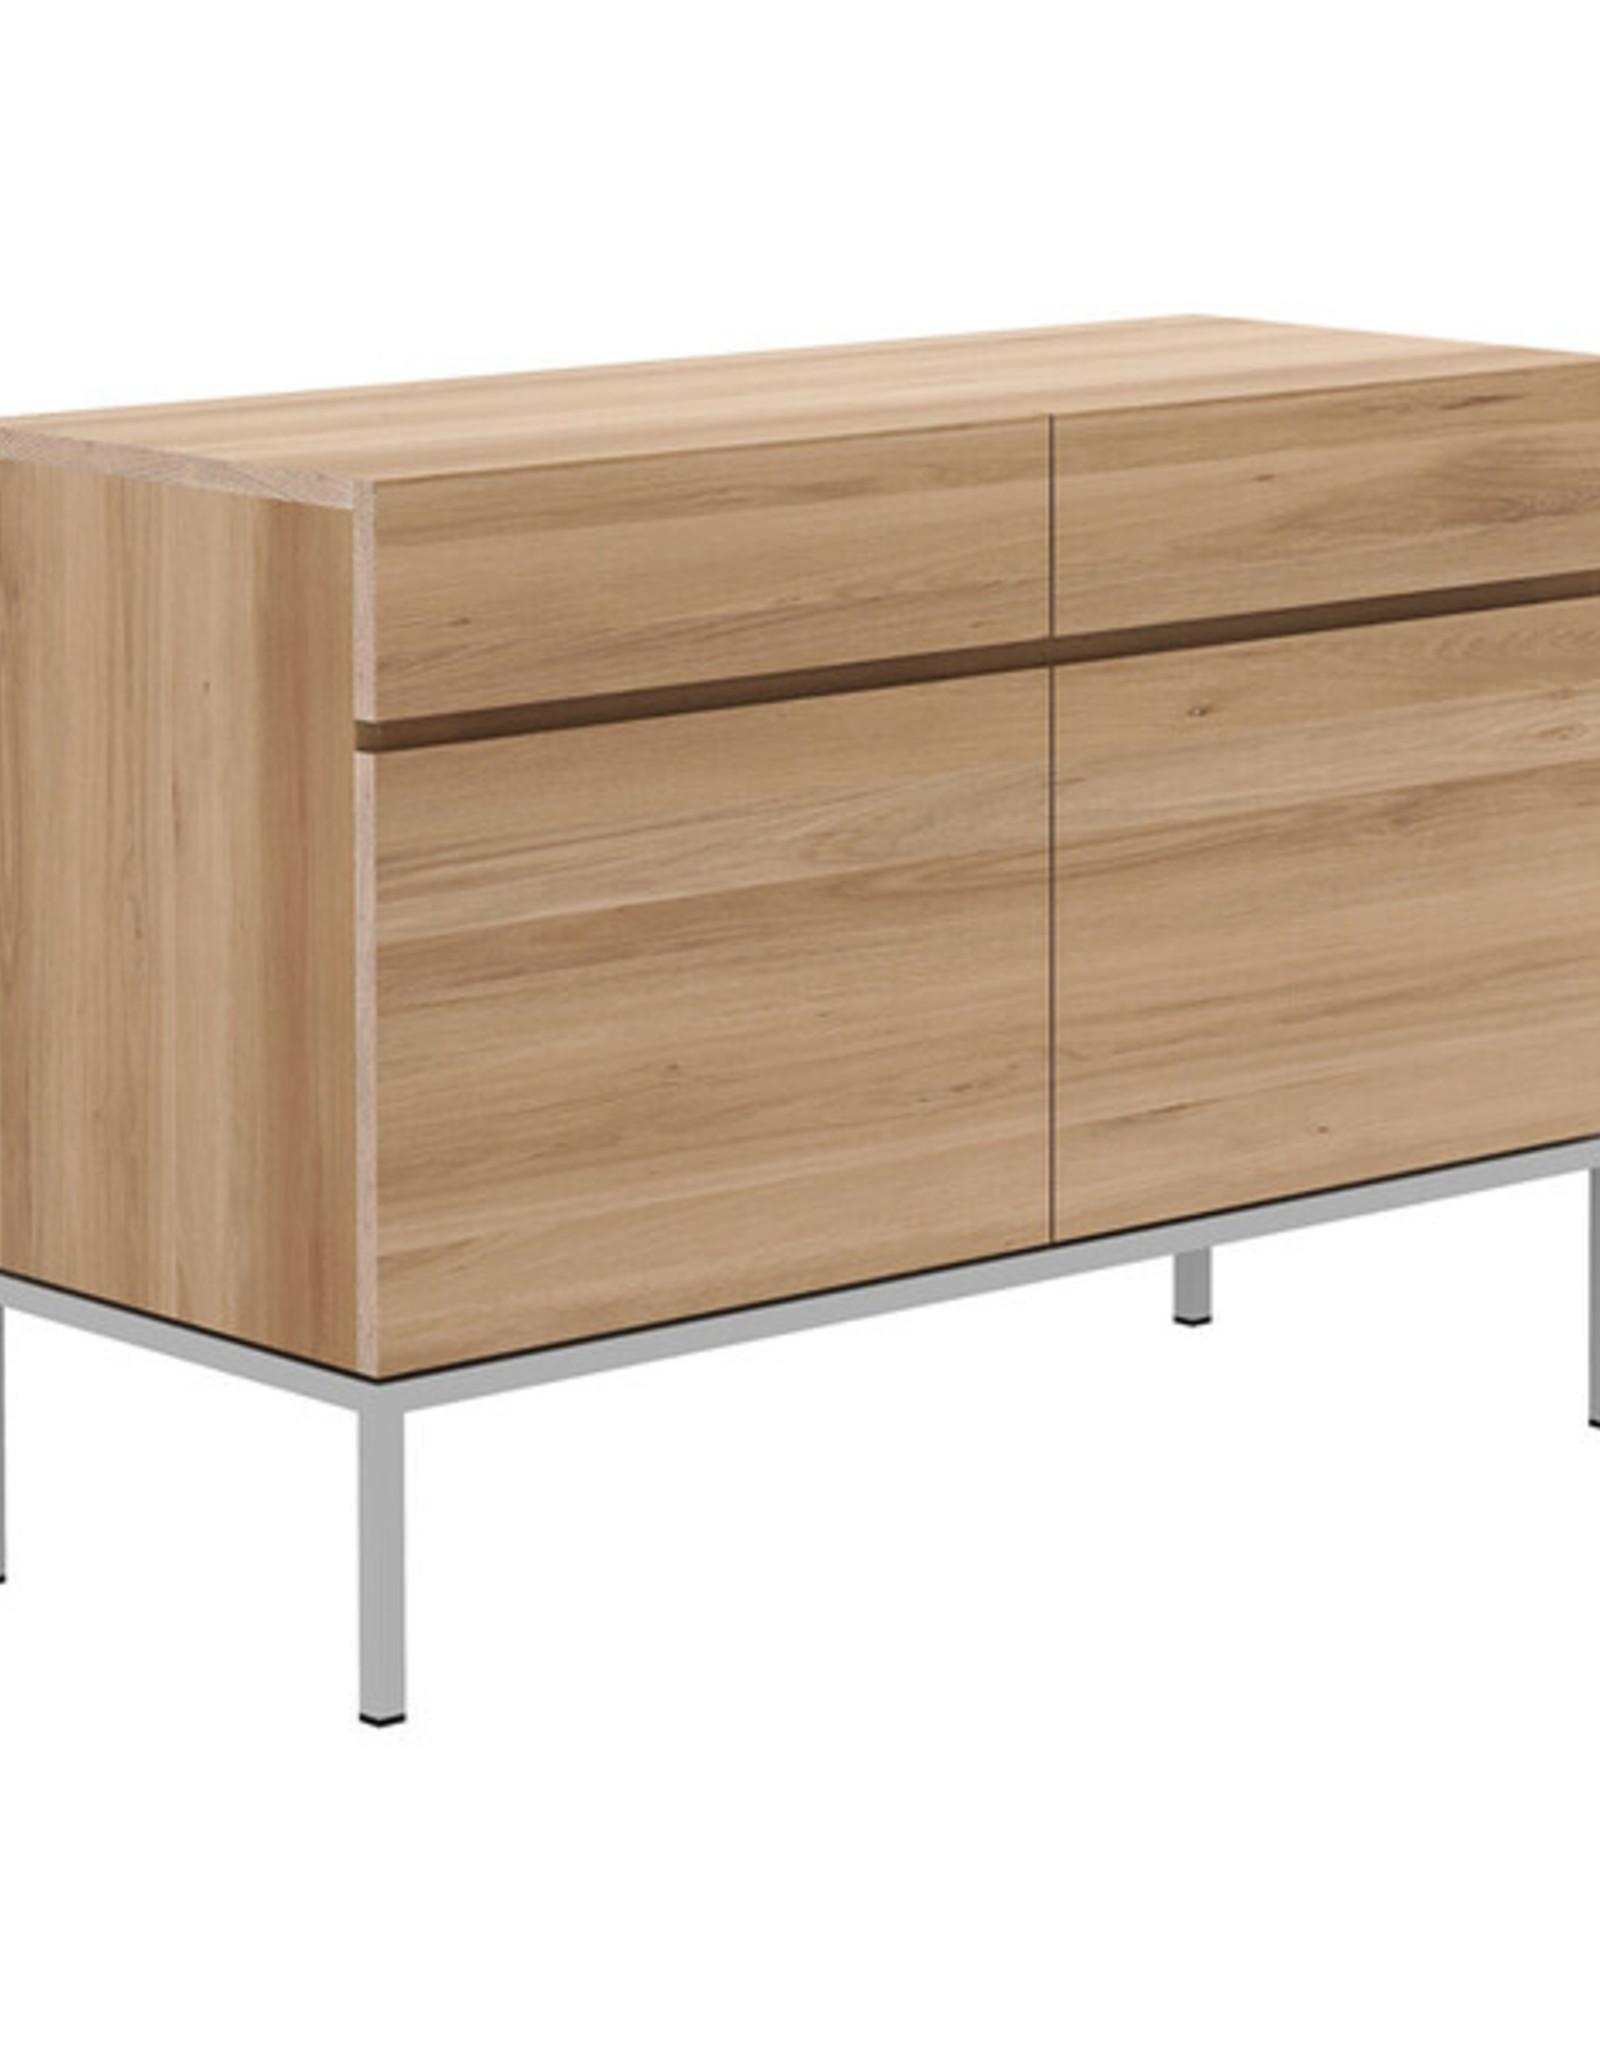 Oak Ligna Sideboard - 2 Doors/2 Drawers